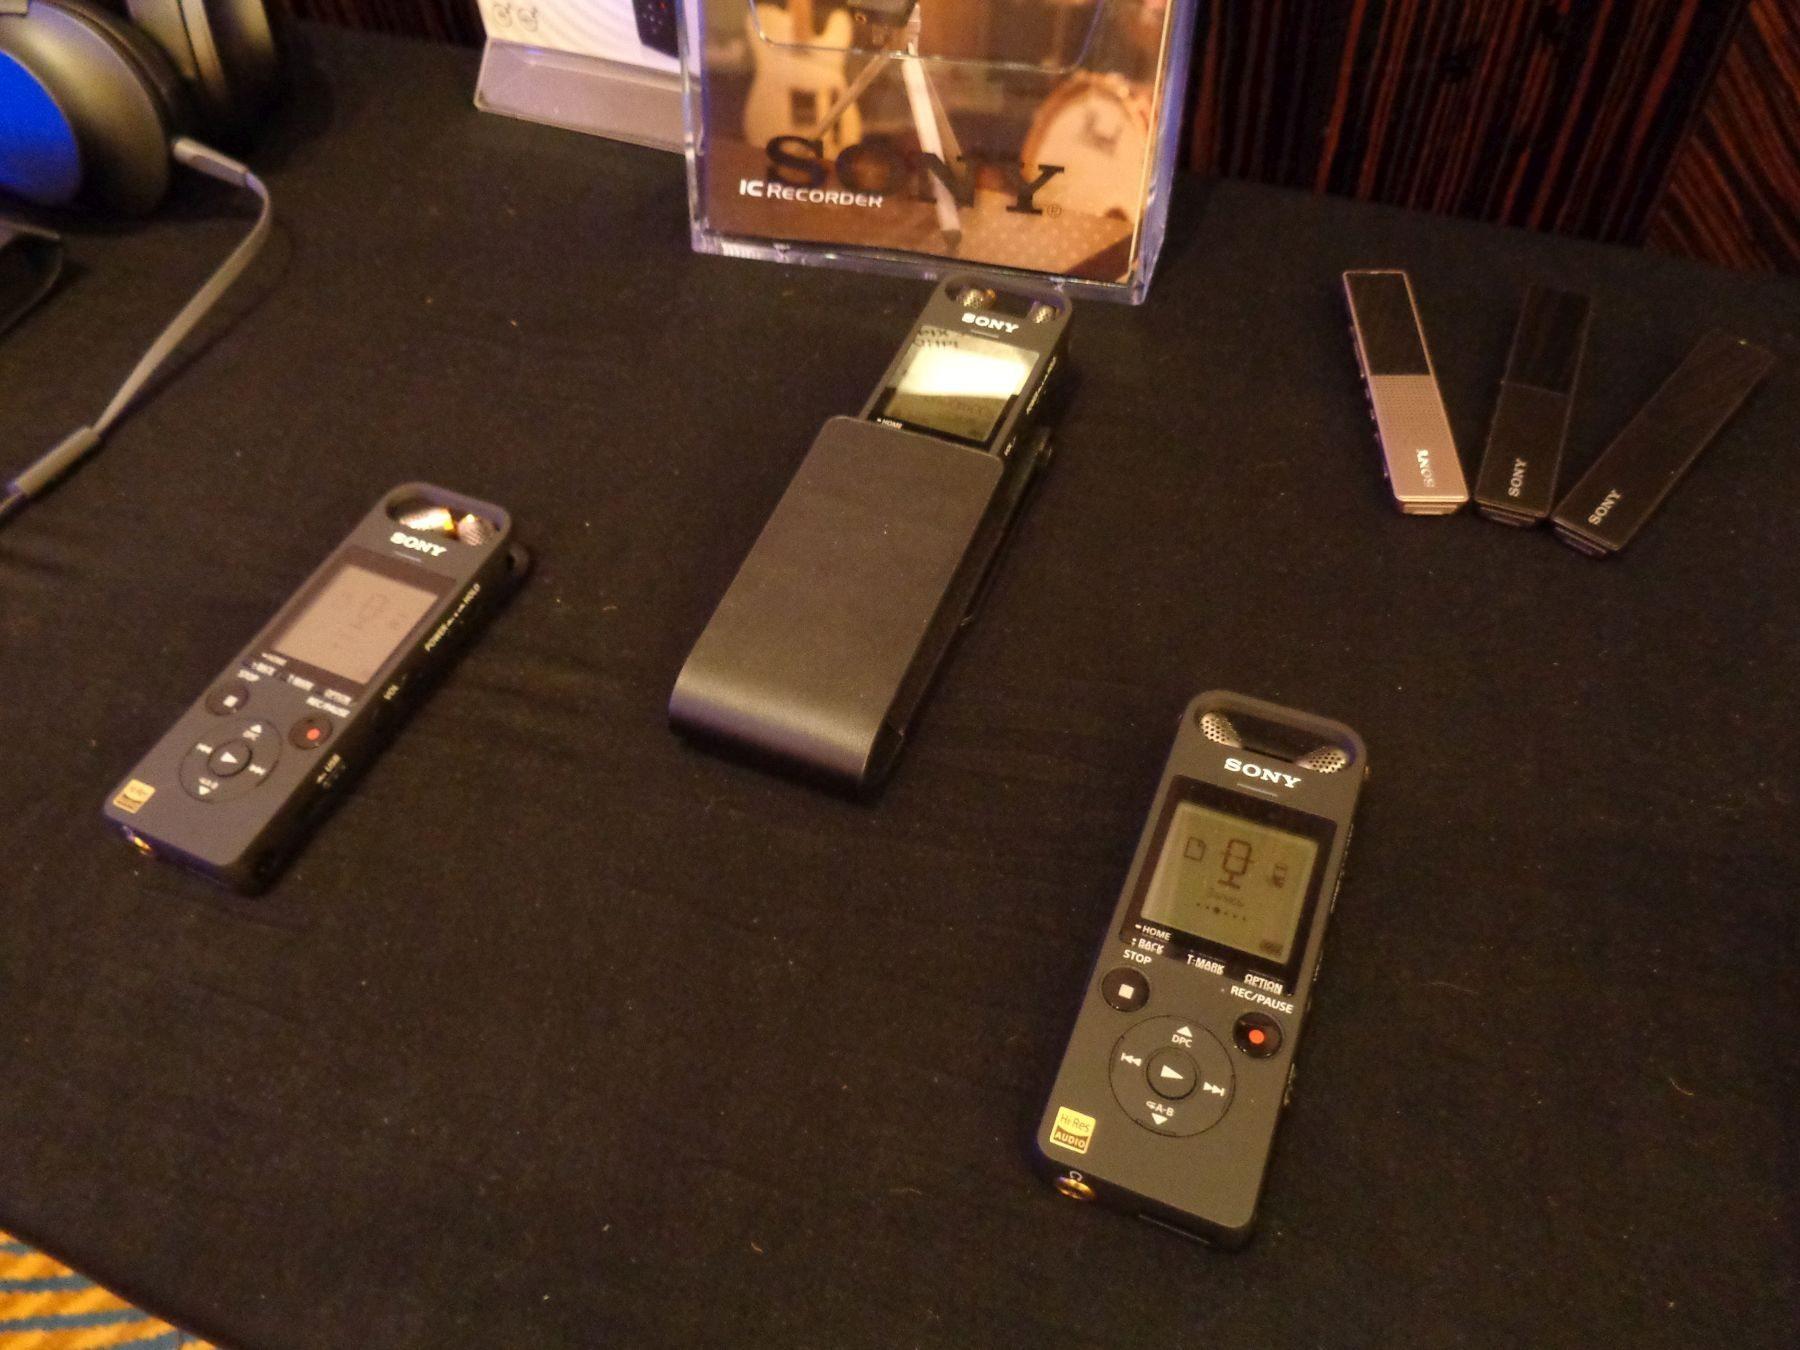 Sony ICD-SX2000 box